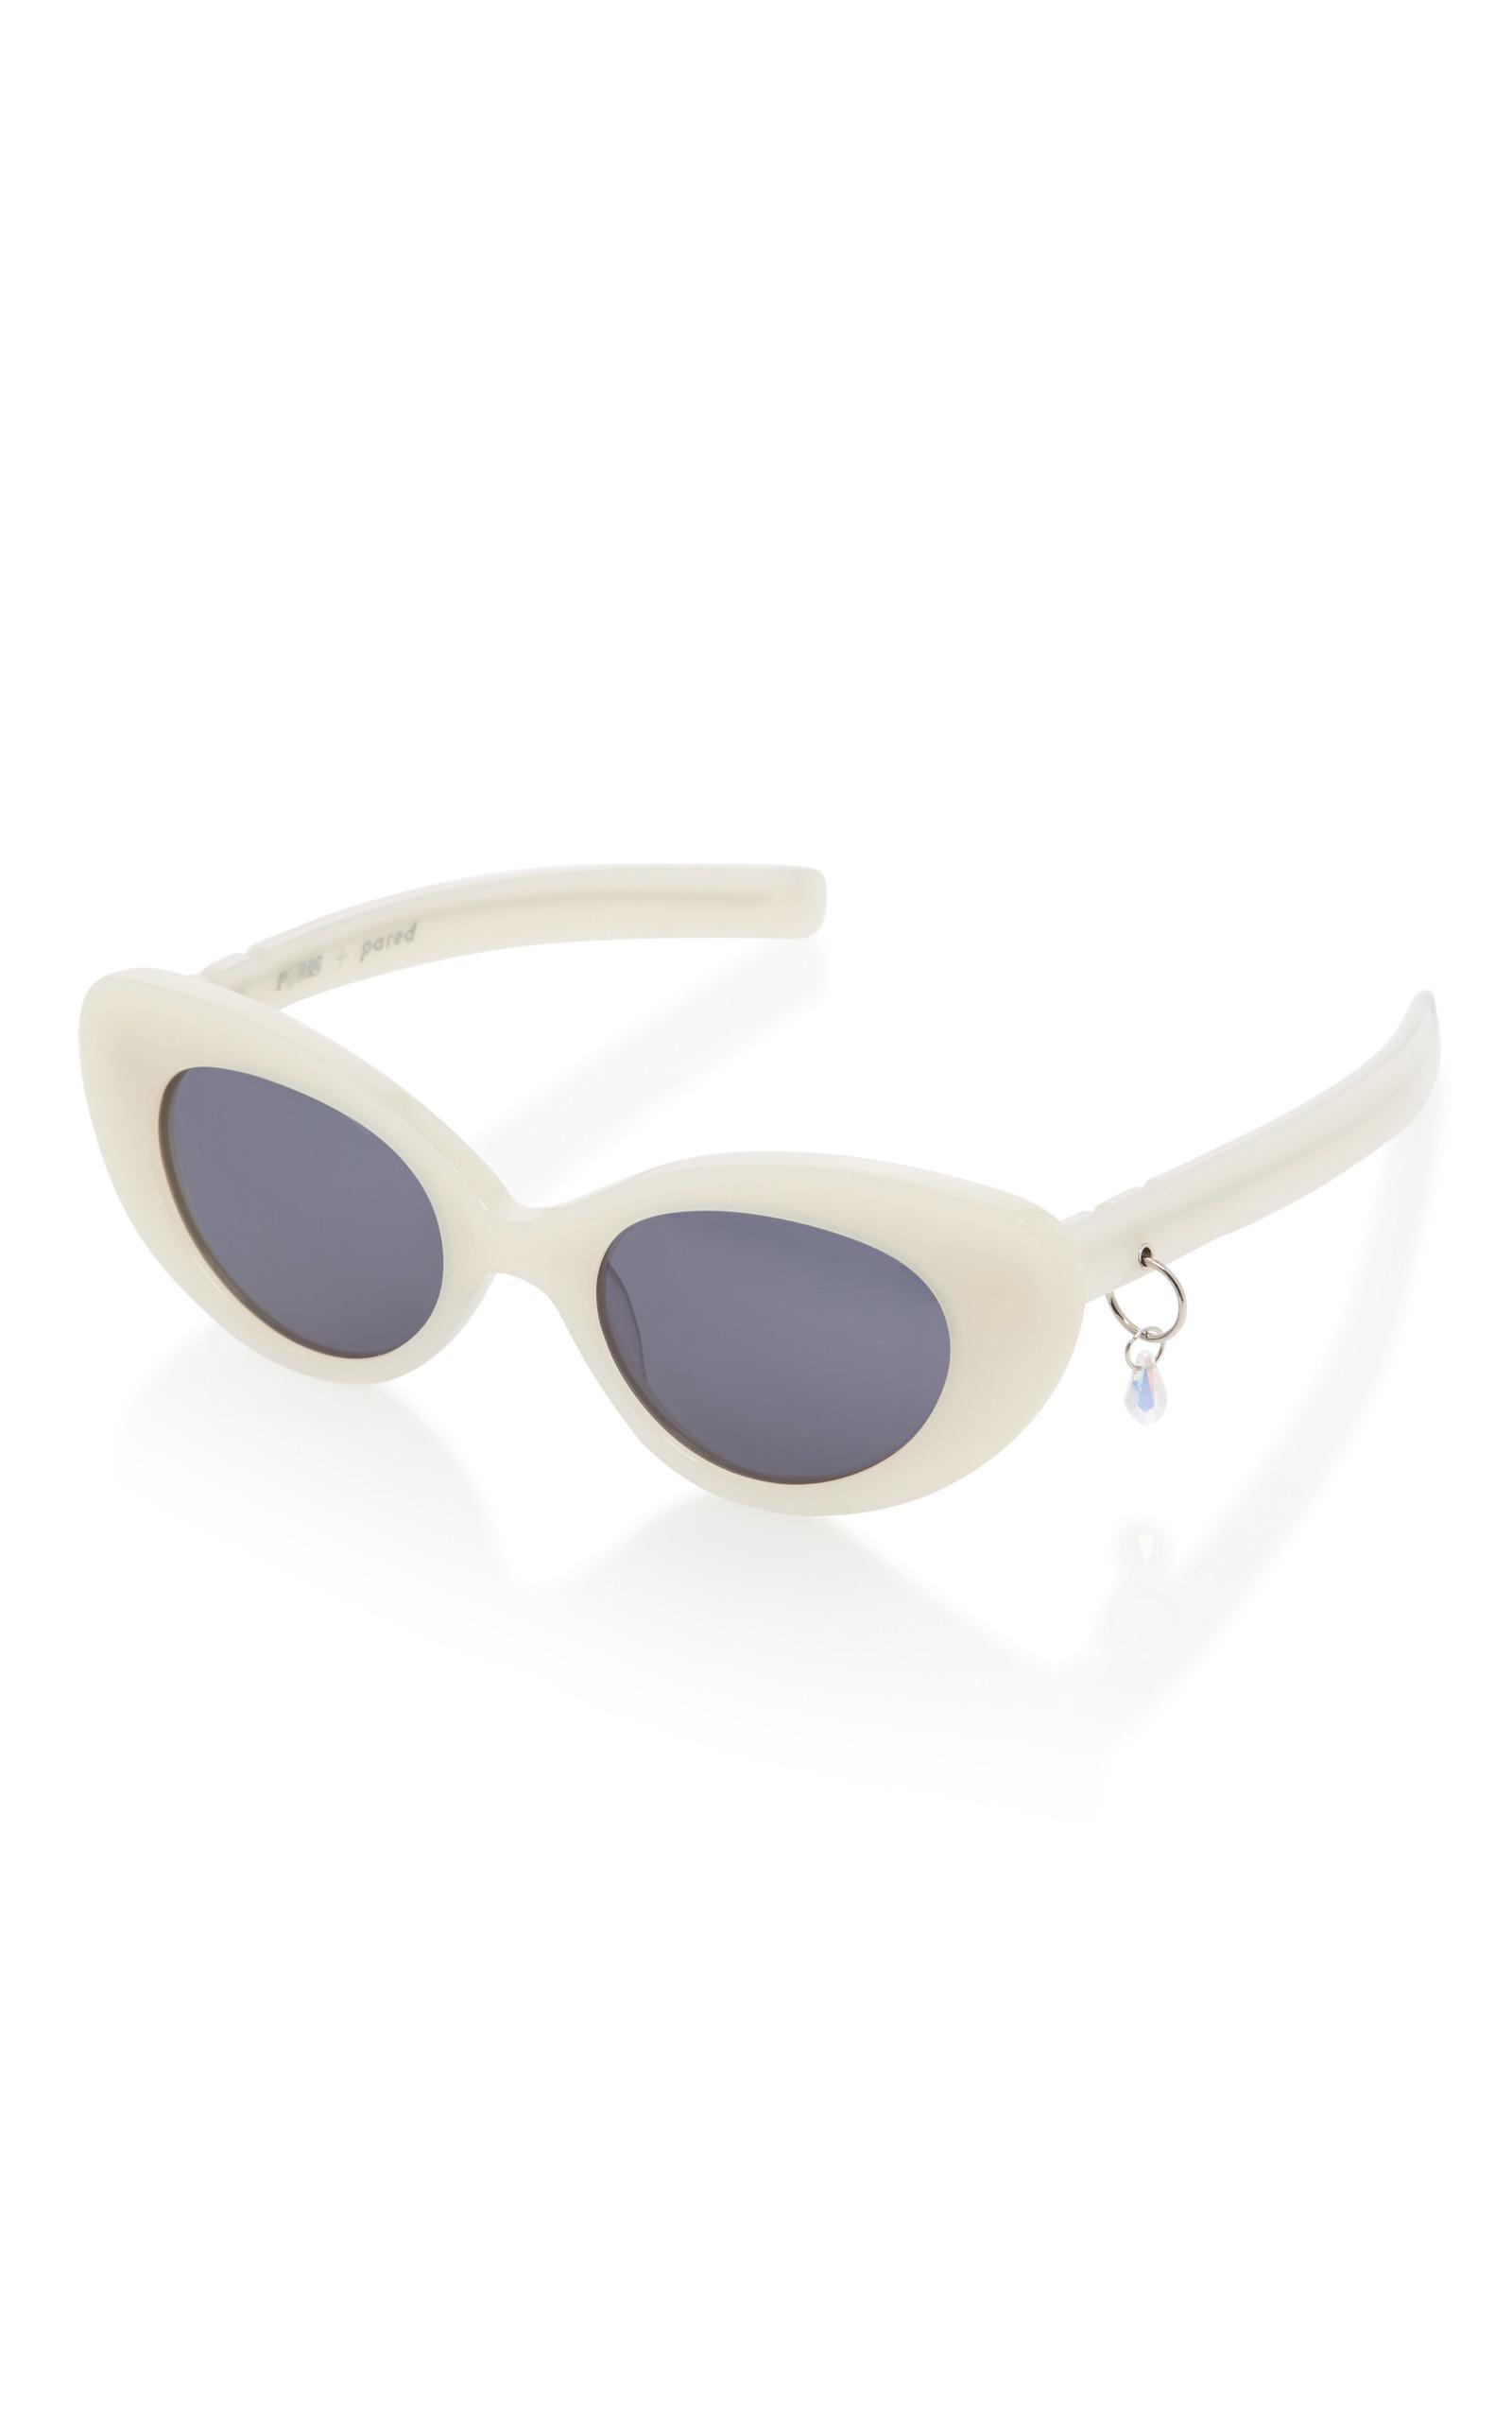 Acetate Cate-Eye Sunglasses Pared Eyewear 1NKwfPe16